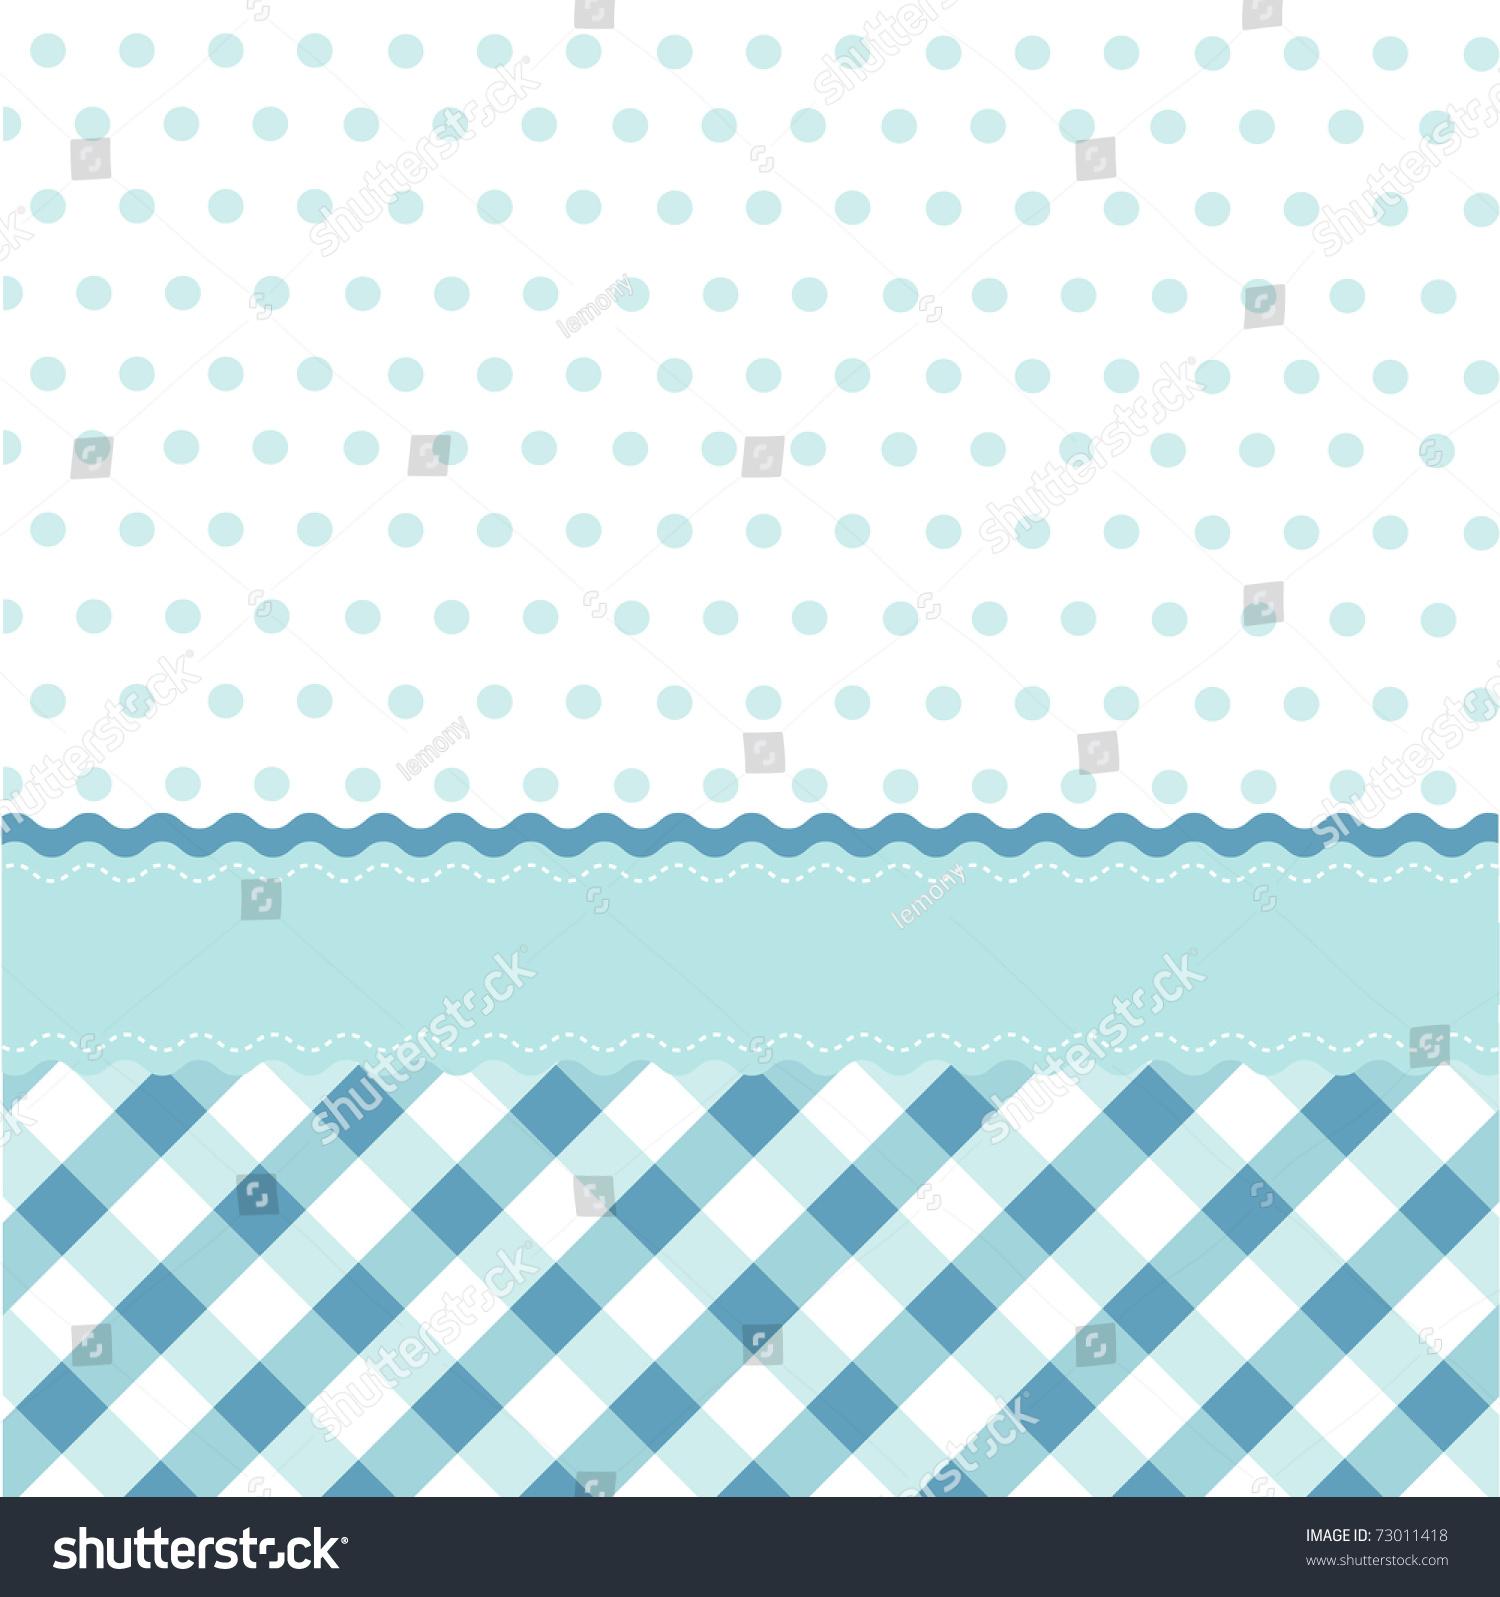 Baby blue wallpaper designs for Blue patterned wallpaper bedroom